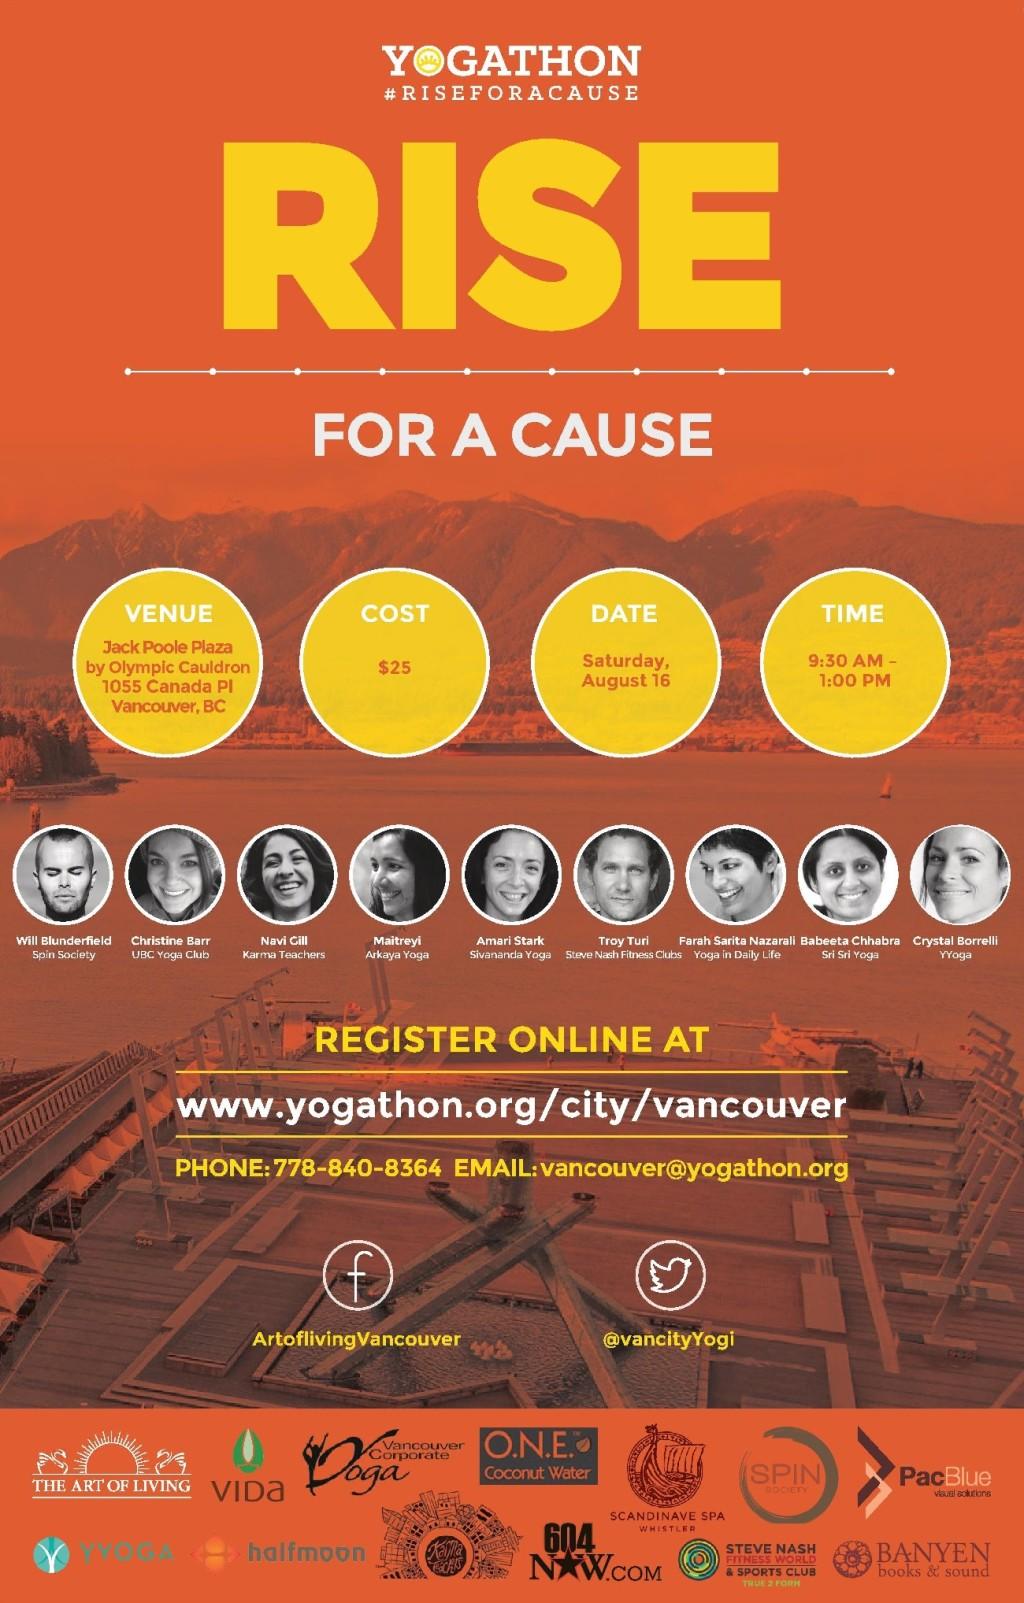 yogathon-vancouver-2014